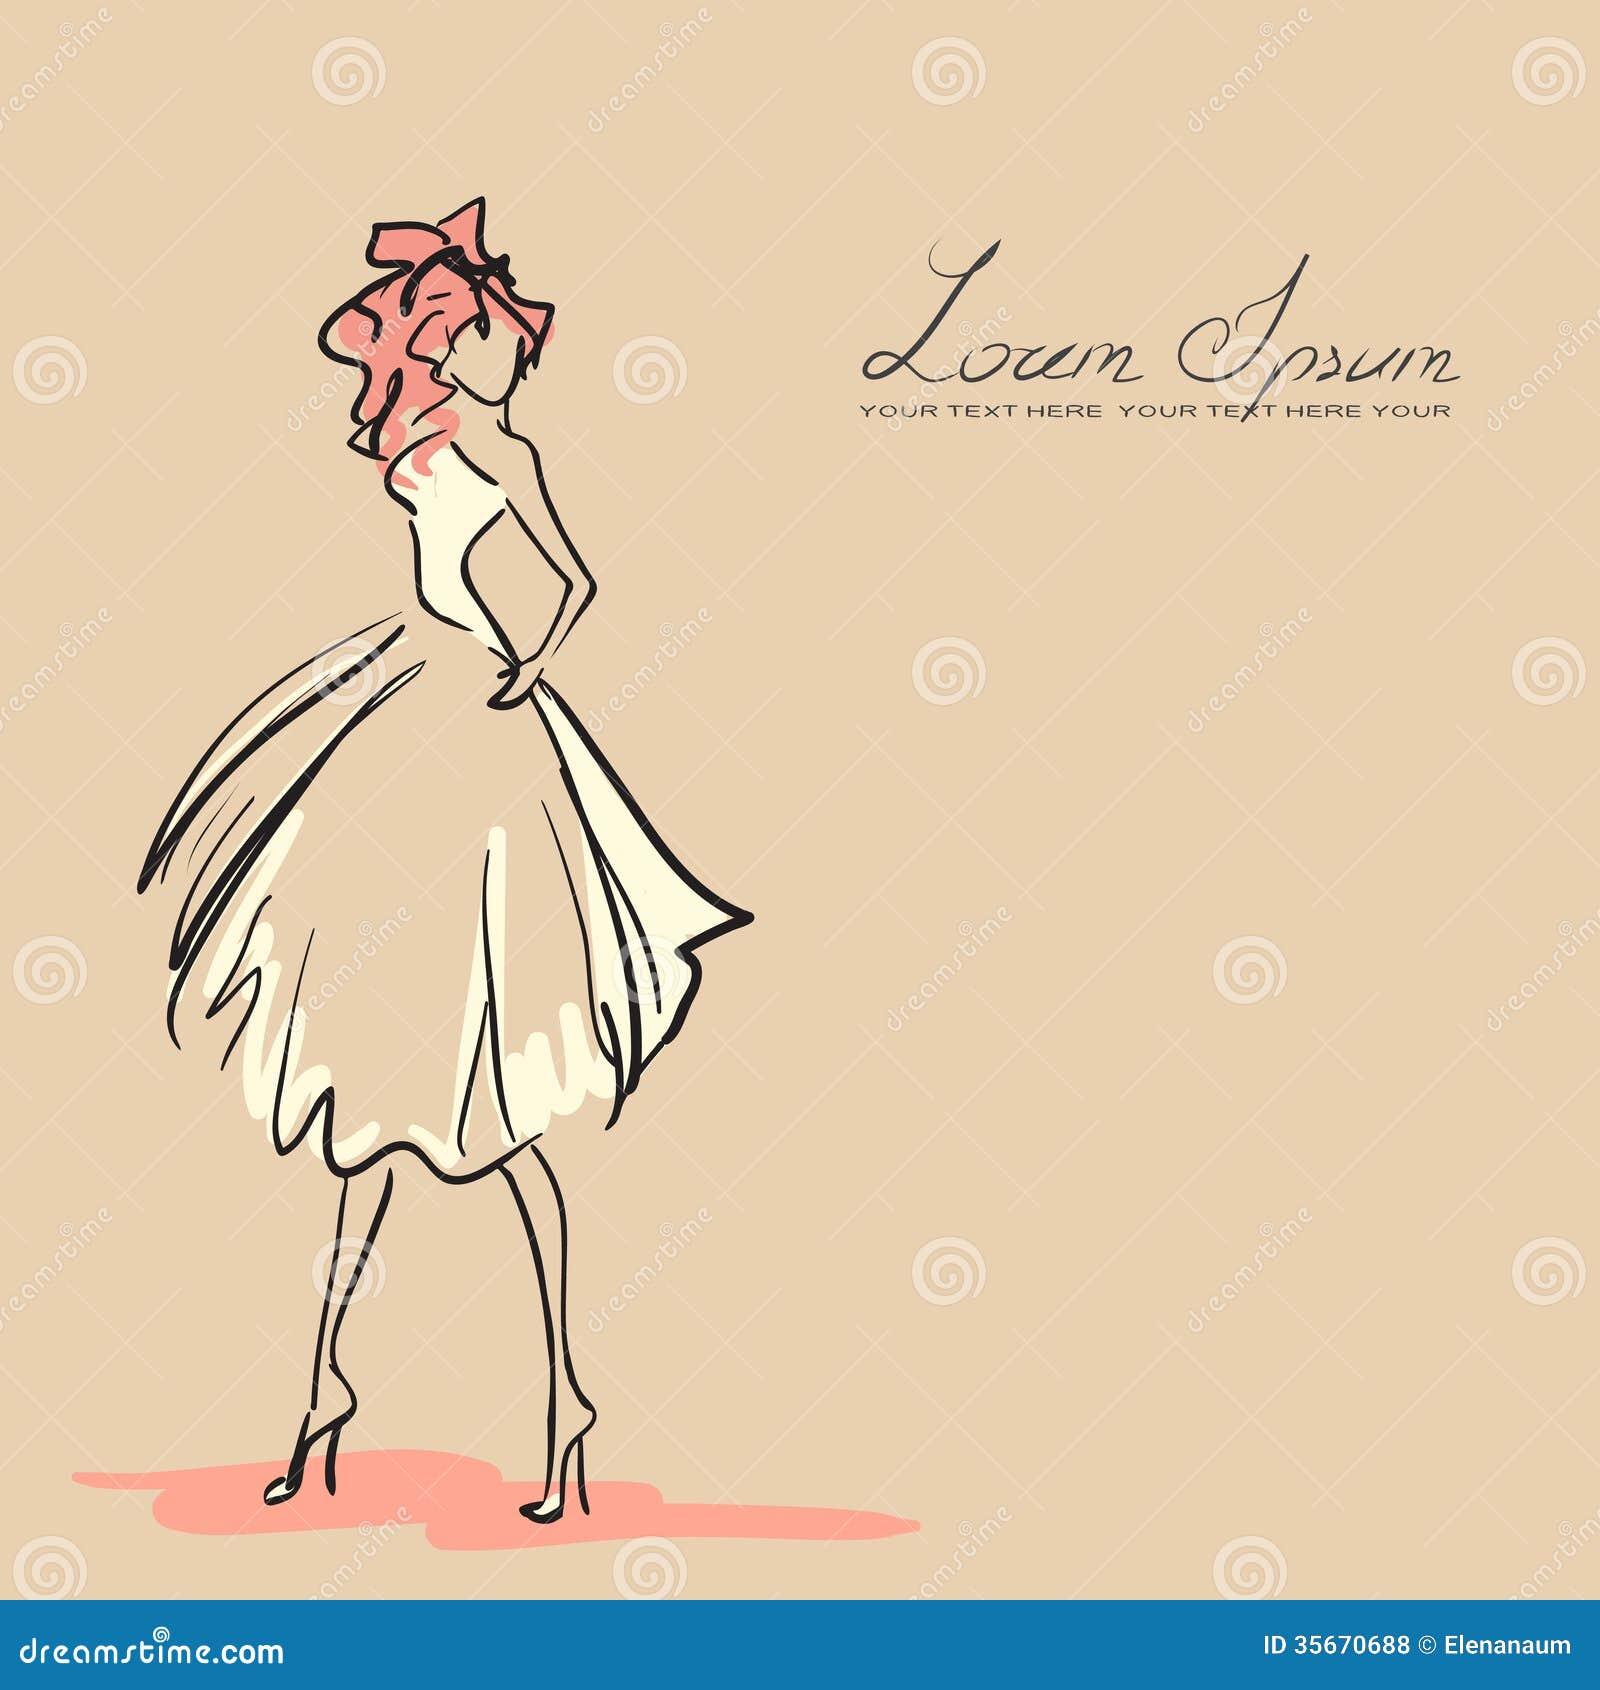 Fantastic Woman In Beautiful Dress Vector By Viktoria1703  Image 1064752